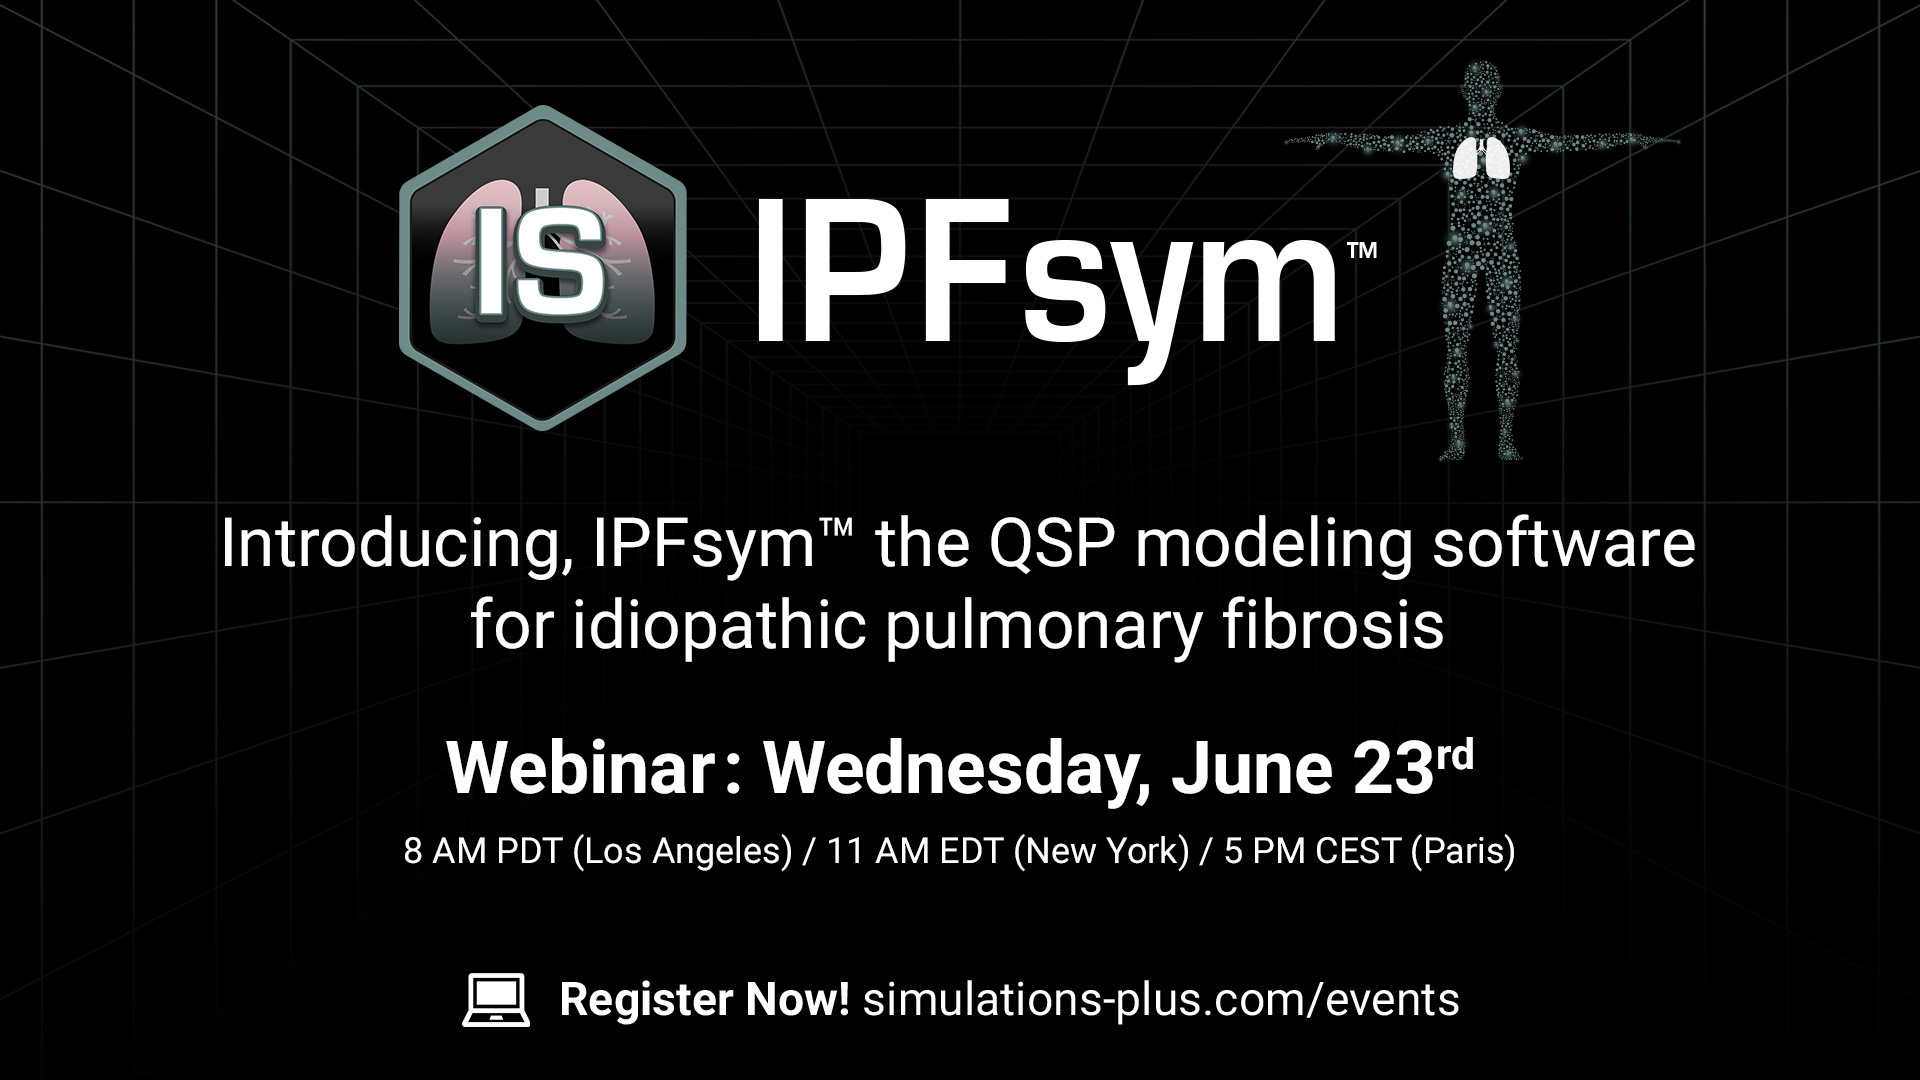 IPFsym introducing IPFsym the QSP modeling software for idiopathic pulmonary fibrosis webinar